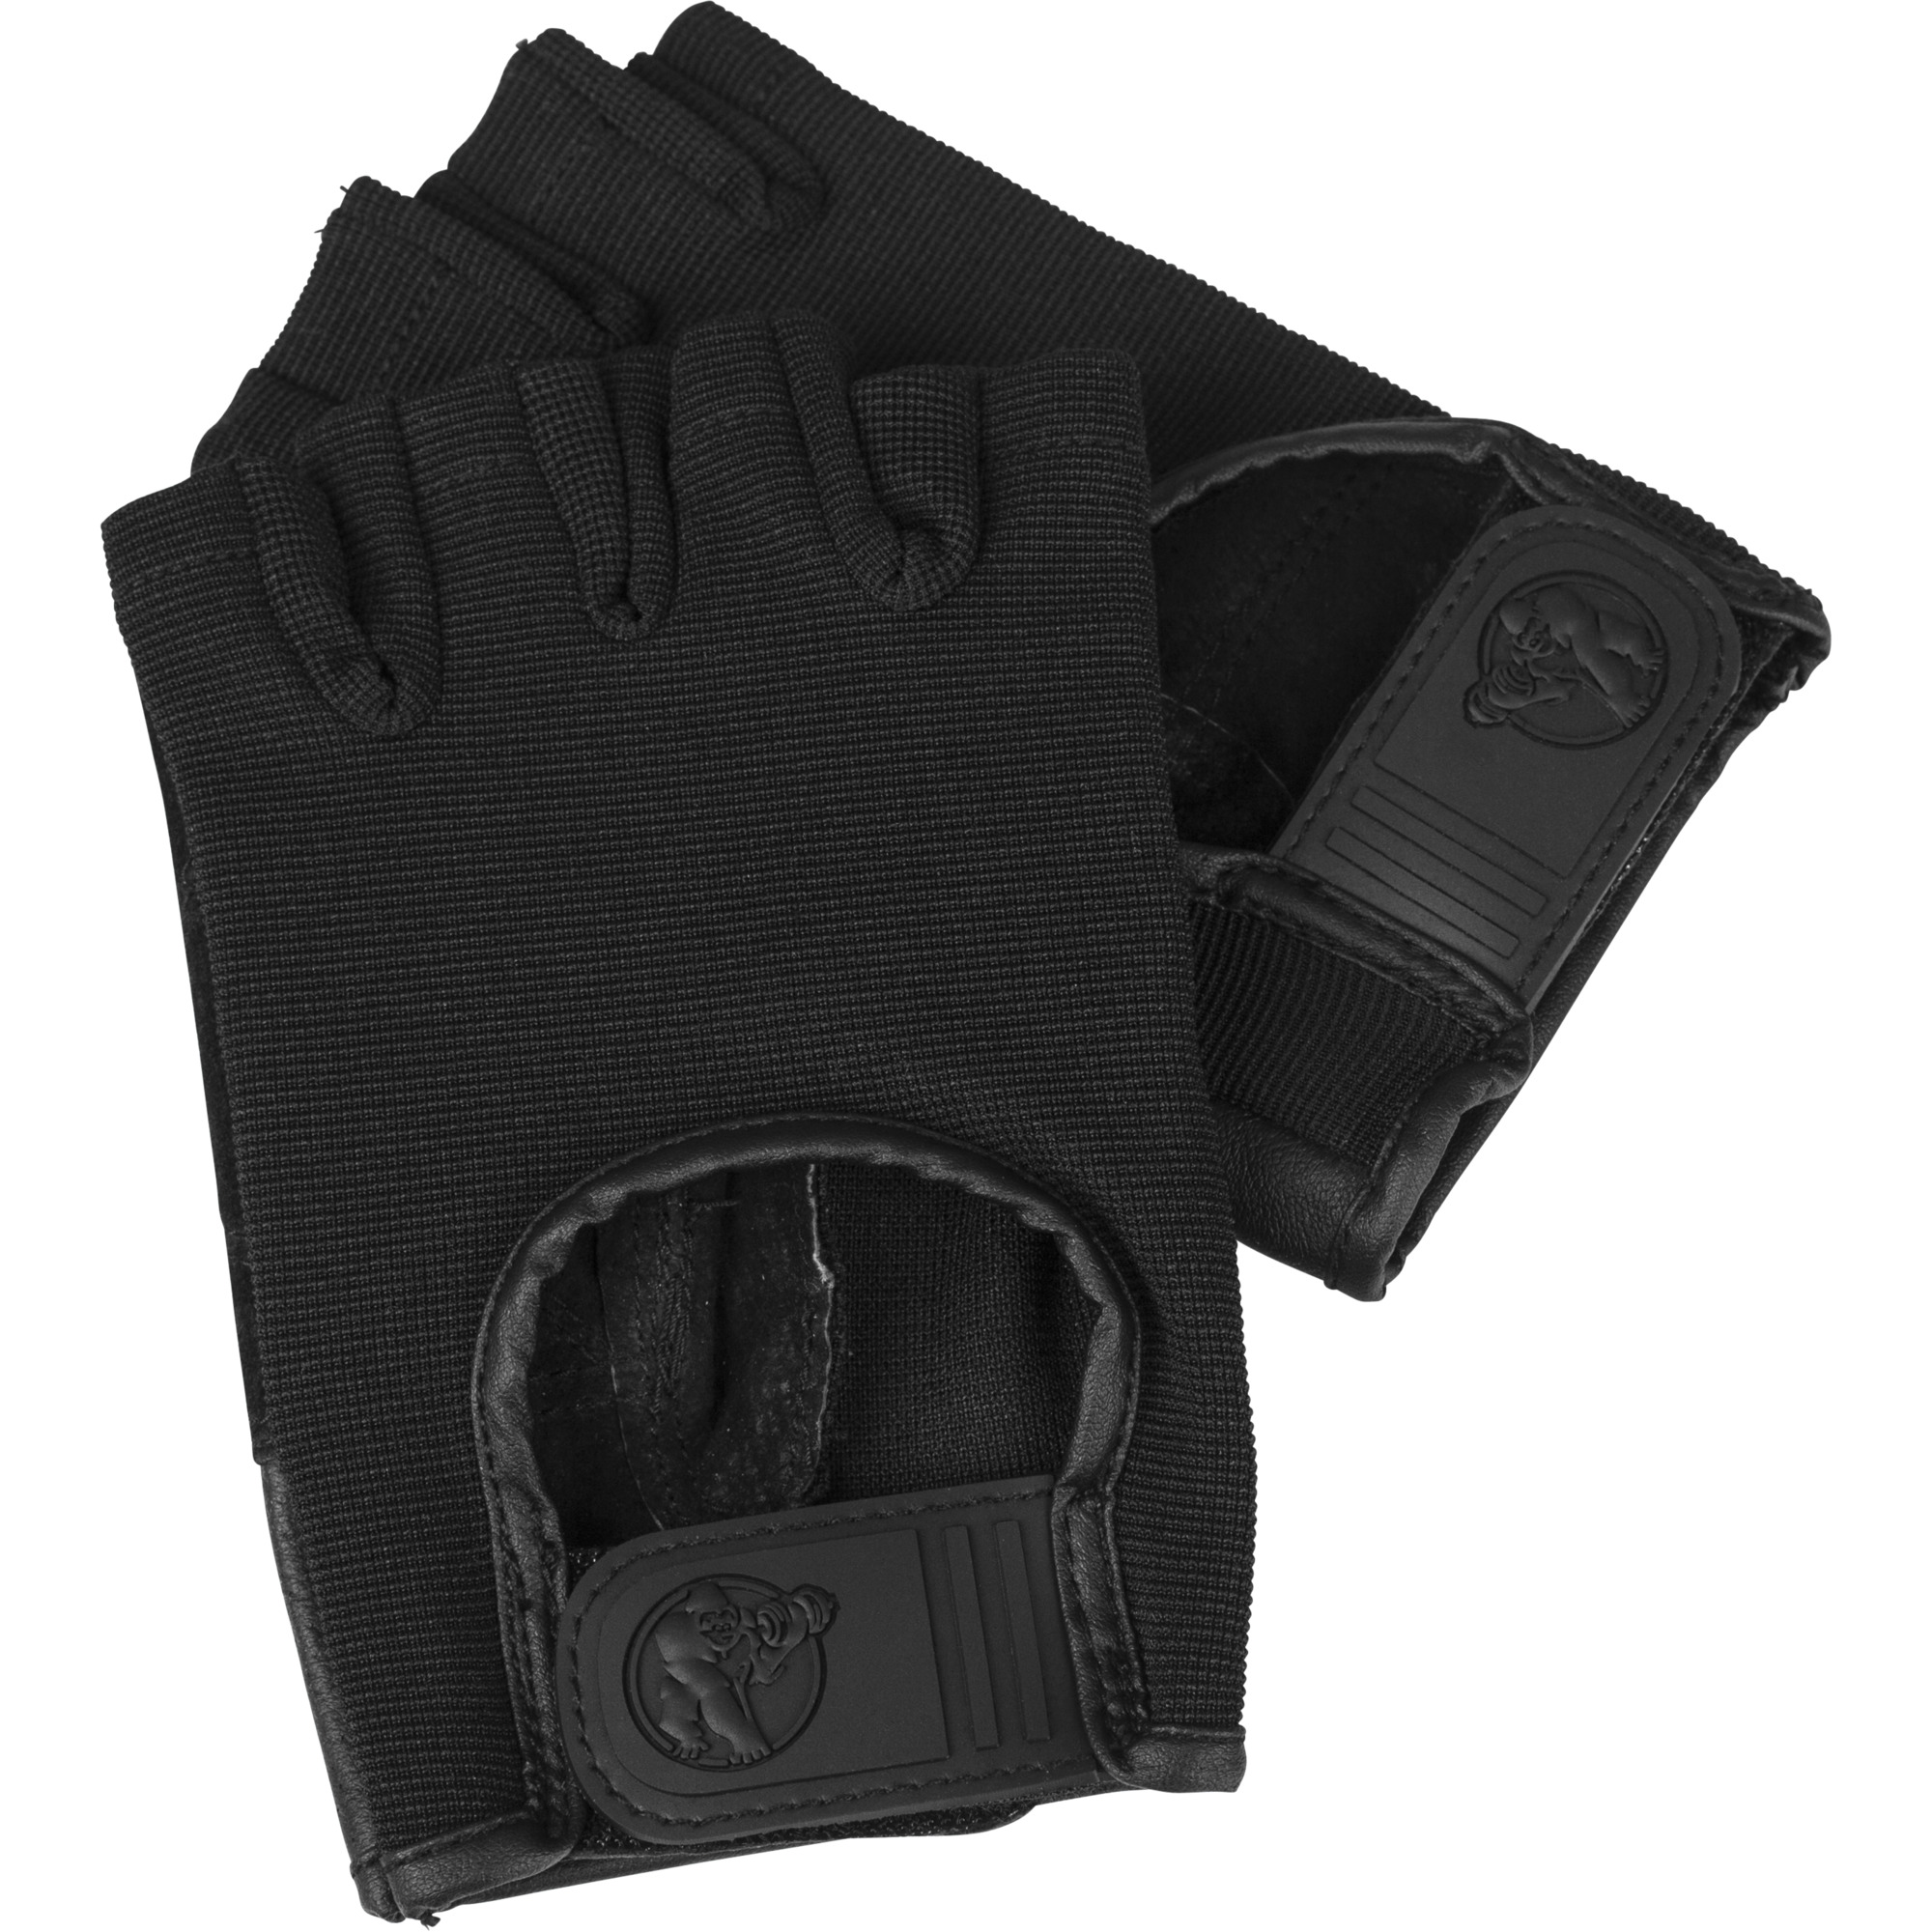 Fitness Handschuhe Leder Schwarz XL